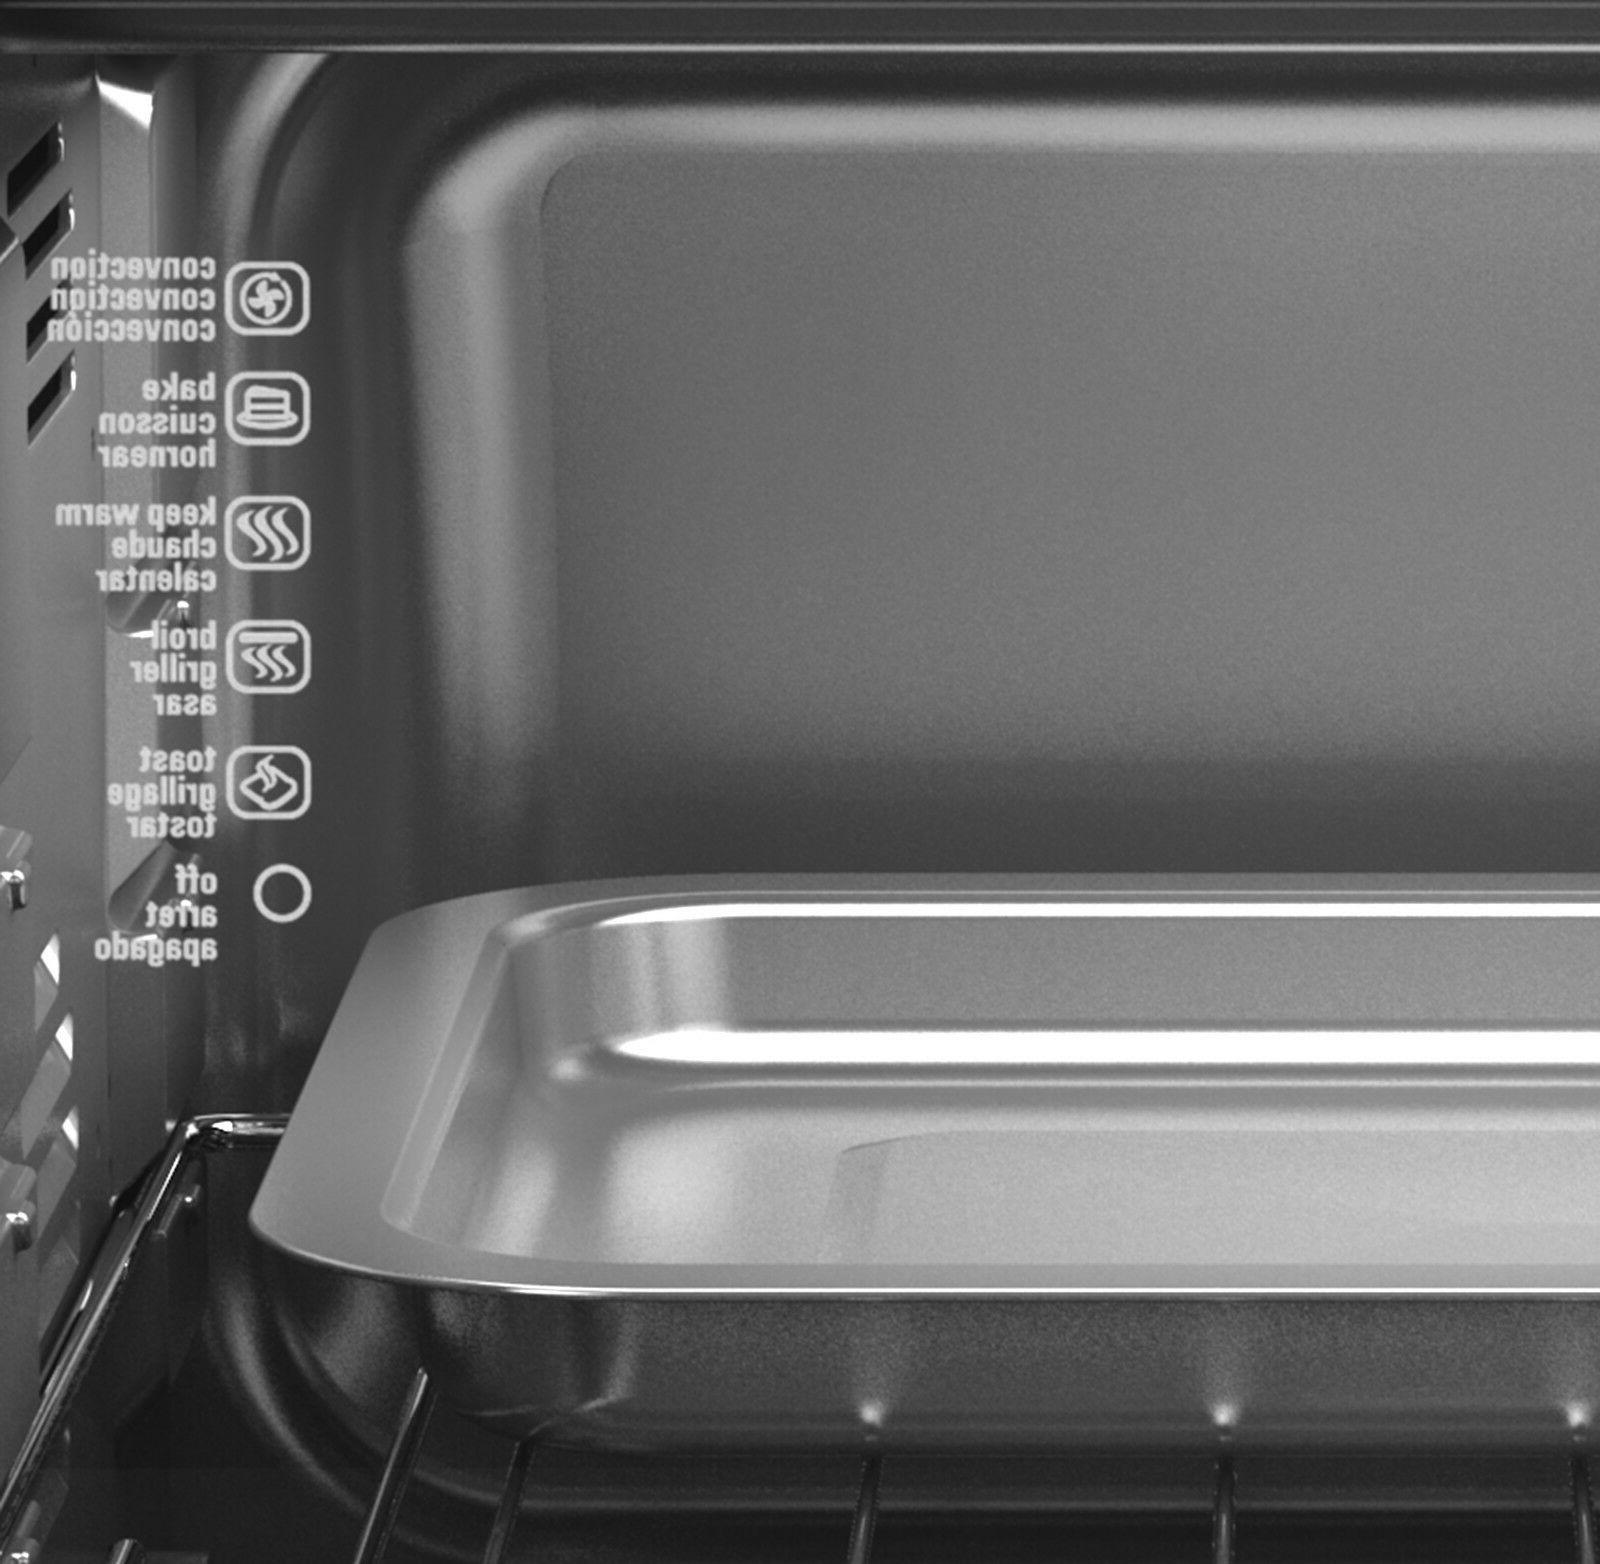 Commercial Oven Decker Toaster Bake